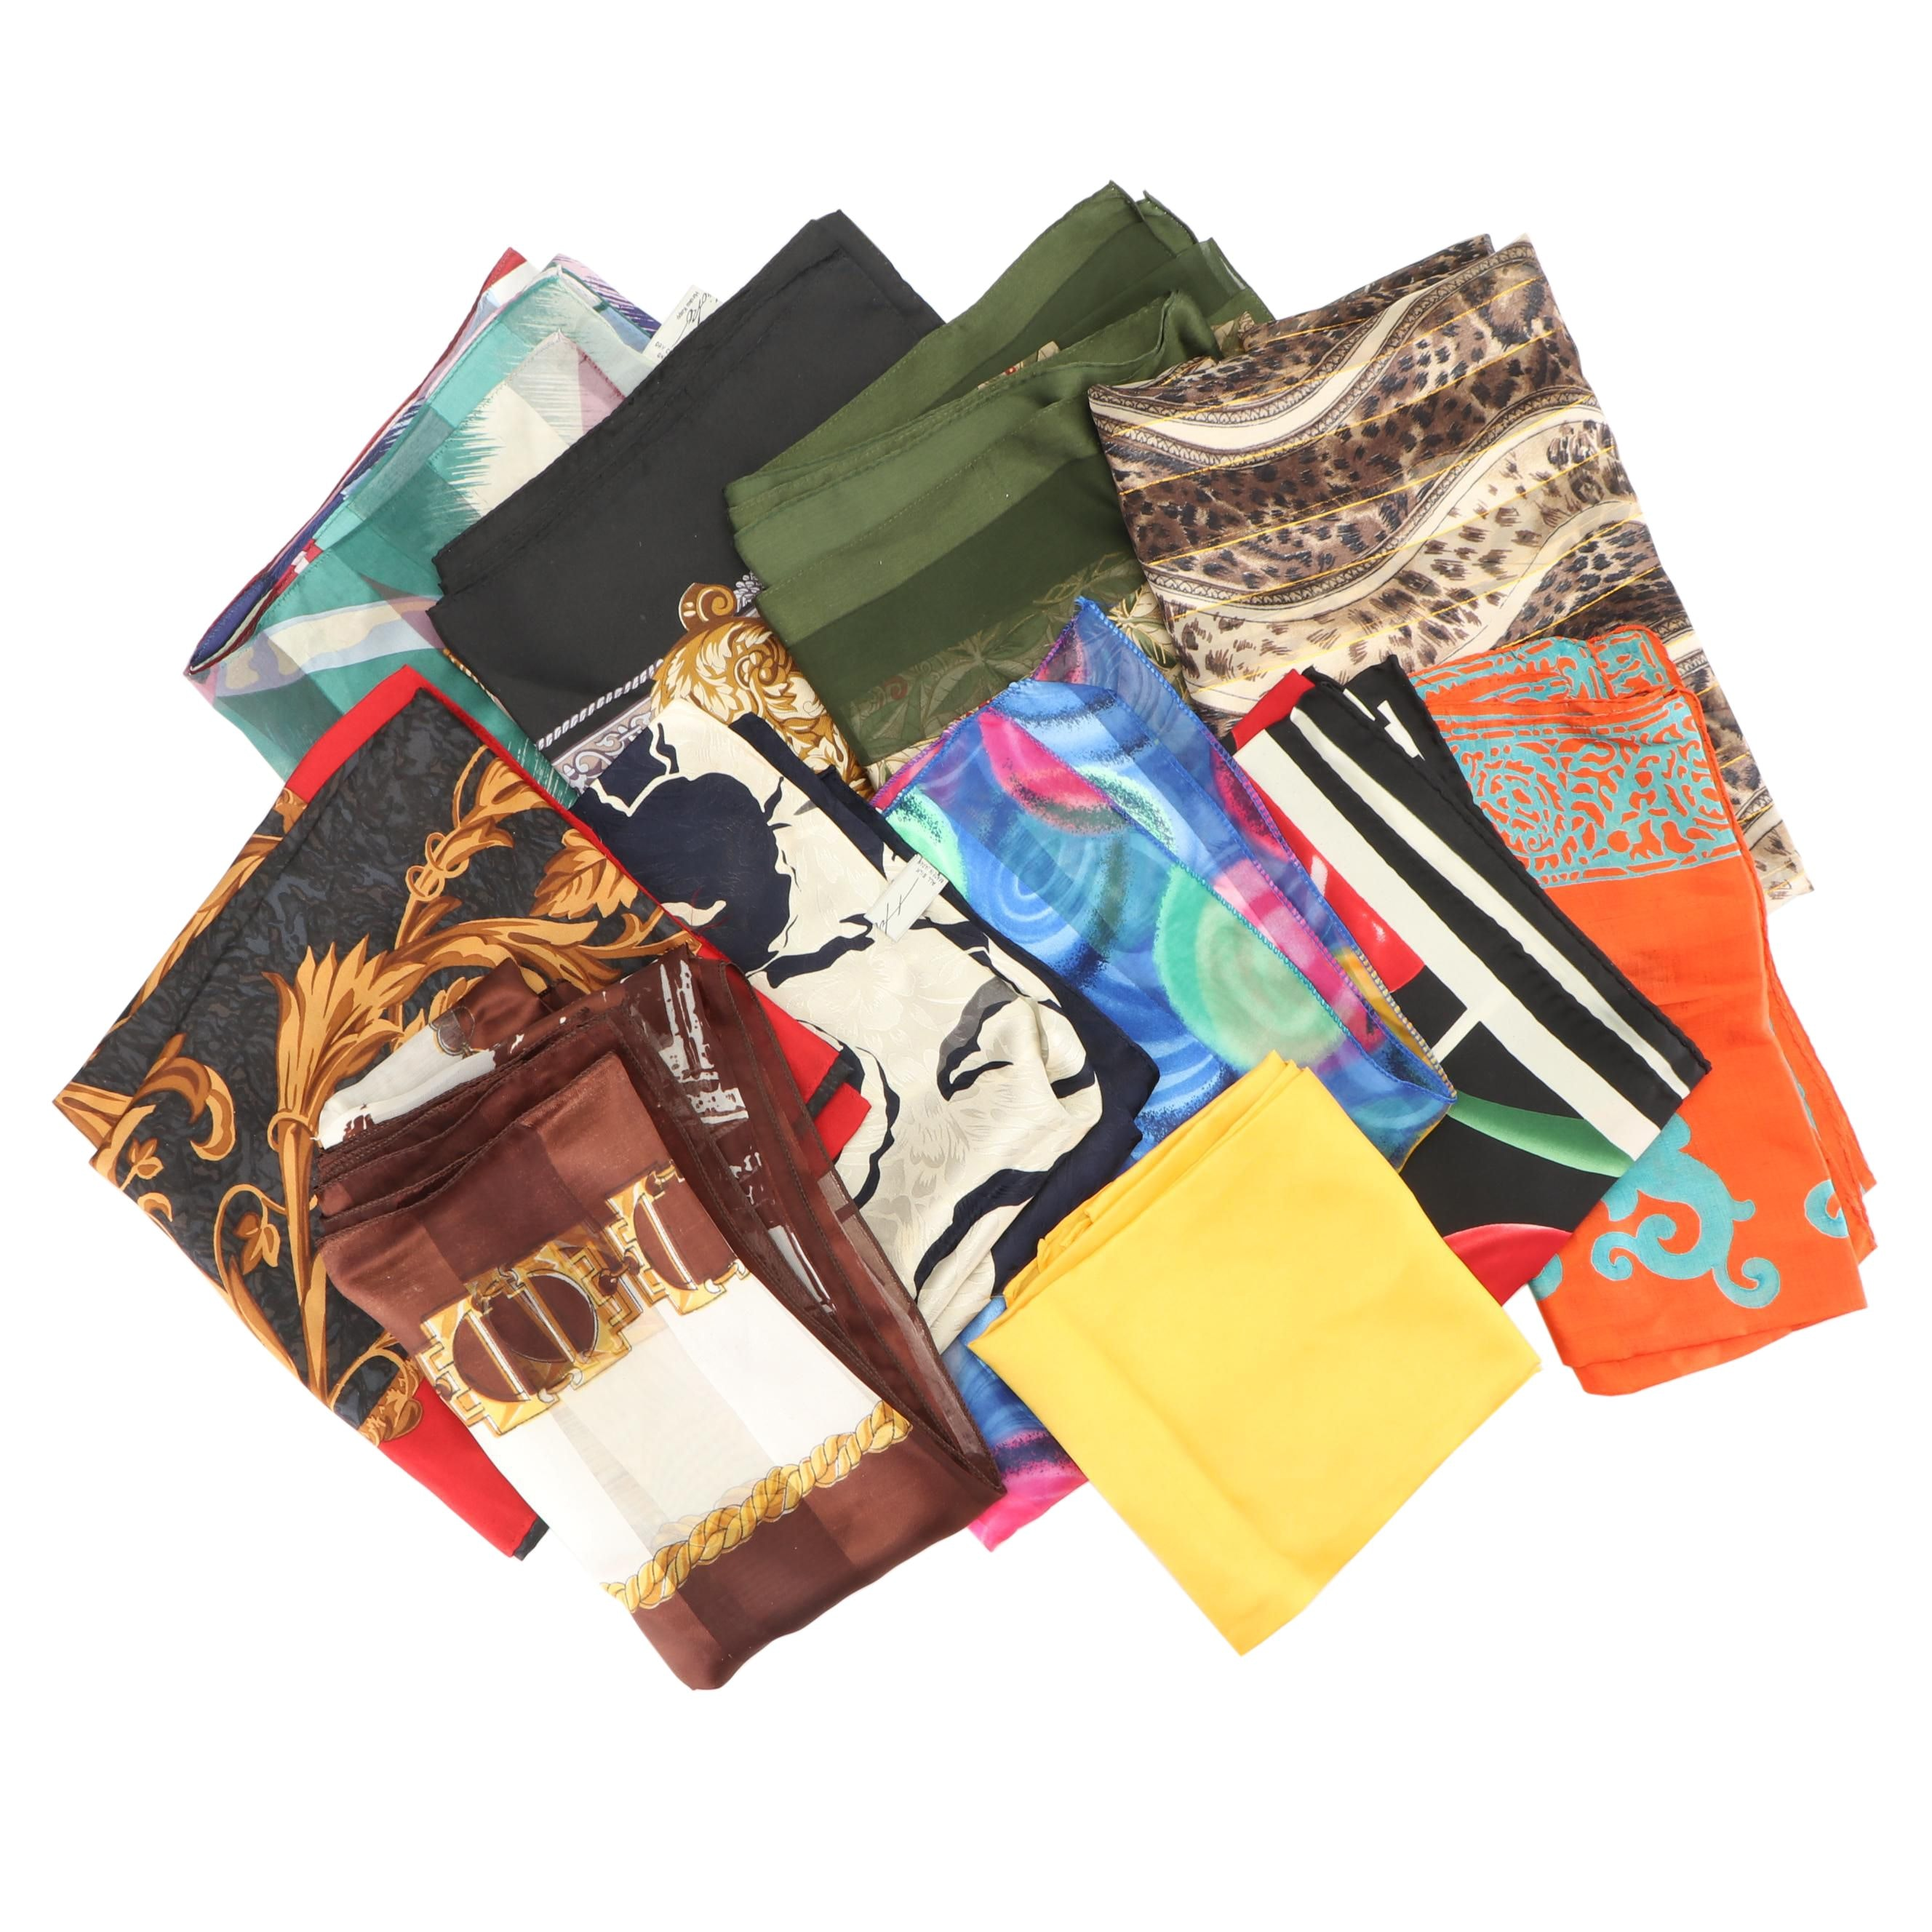 Assortment of Scarves Including Hiroko Kapp